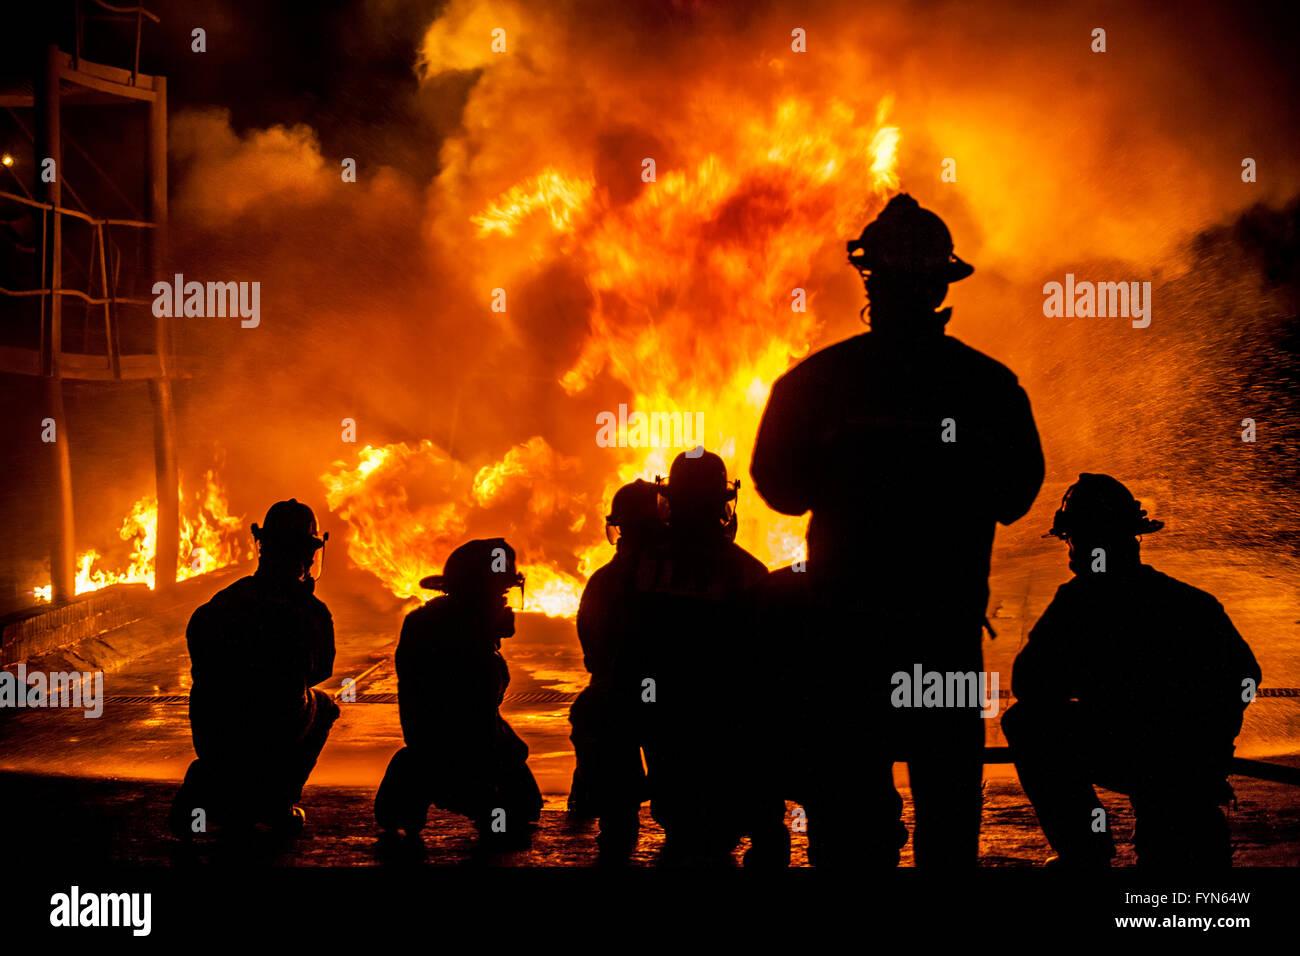 Firefighters fighting burning blaze - Stock Image